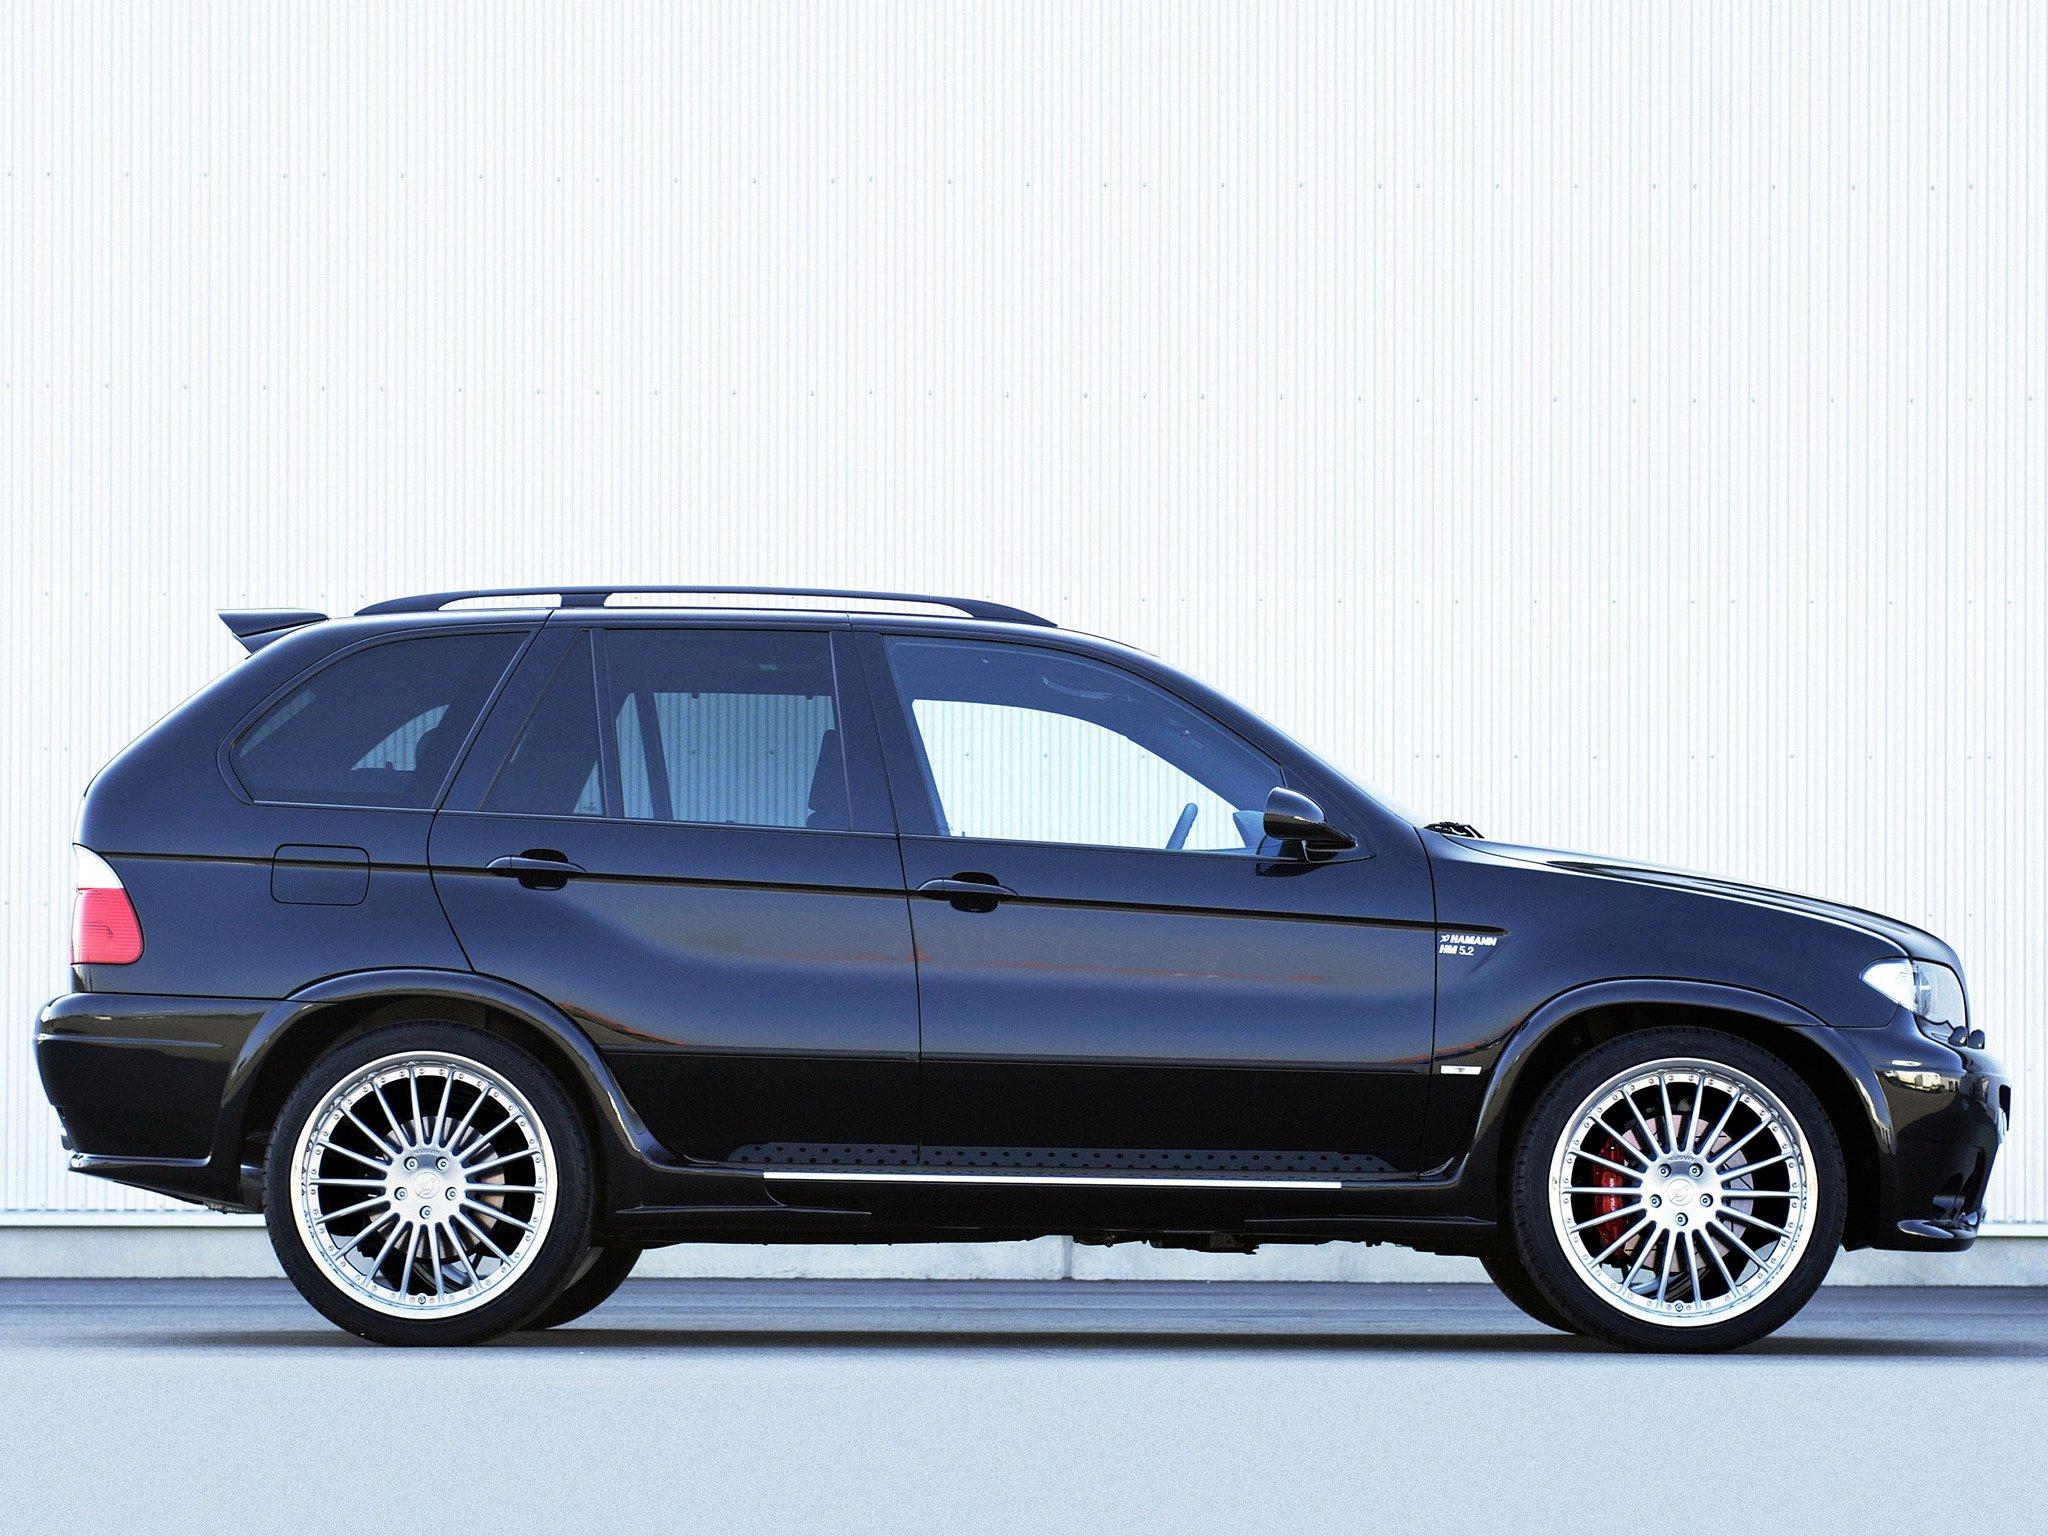 Hamann Bmw X5 E53 Modified Cars 2003 Wallpaper 2048x1536 744341 Wallpaperup